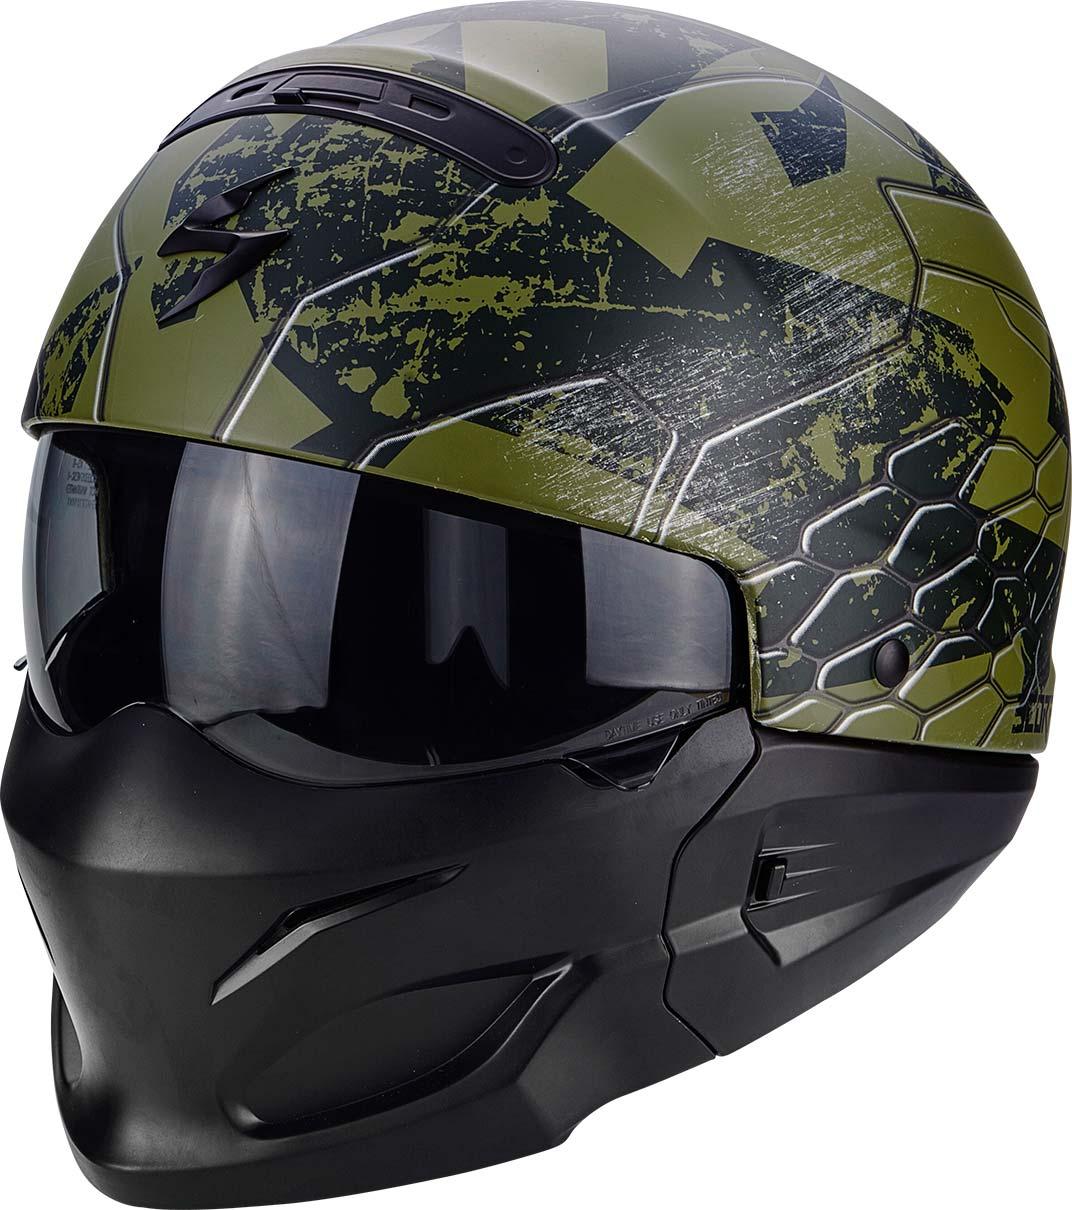 scorpion covert ratnik phantom hybrid helmet. Black Bedroom Furniture Sets. Home Design Ideas